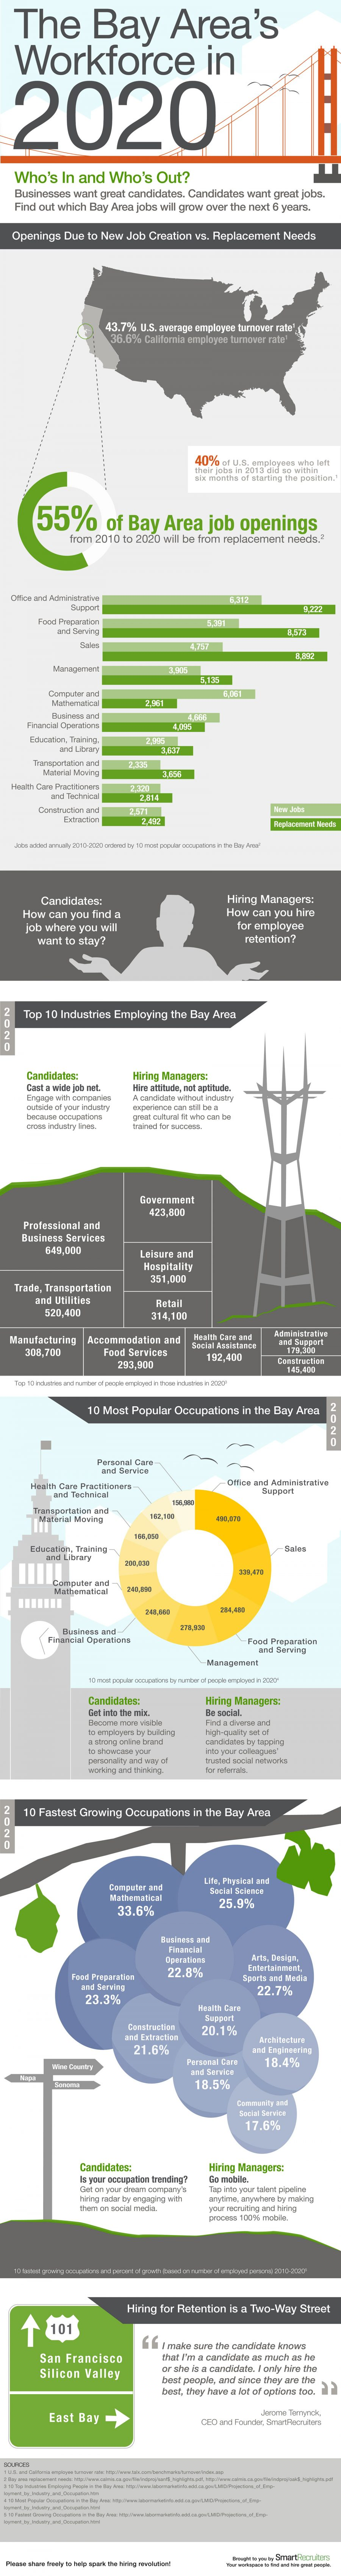 infographic-BayArea_2020Workforce